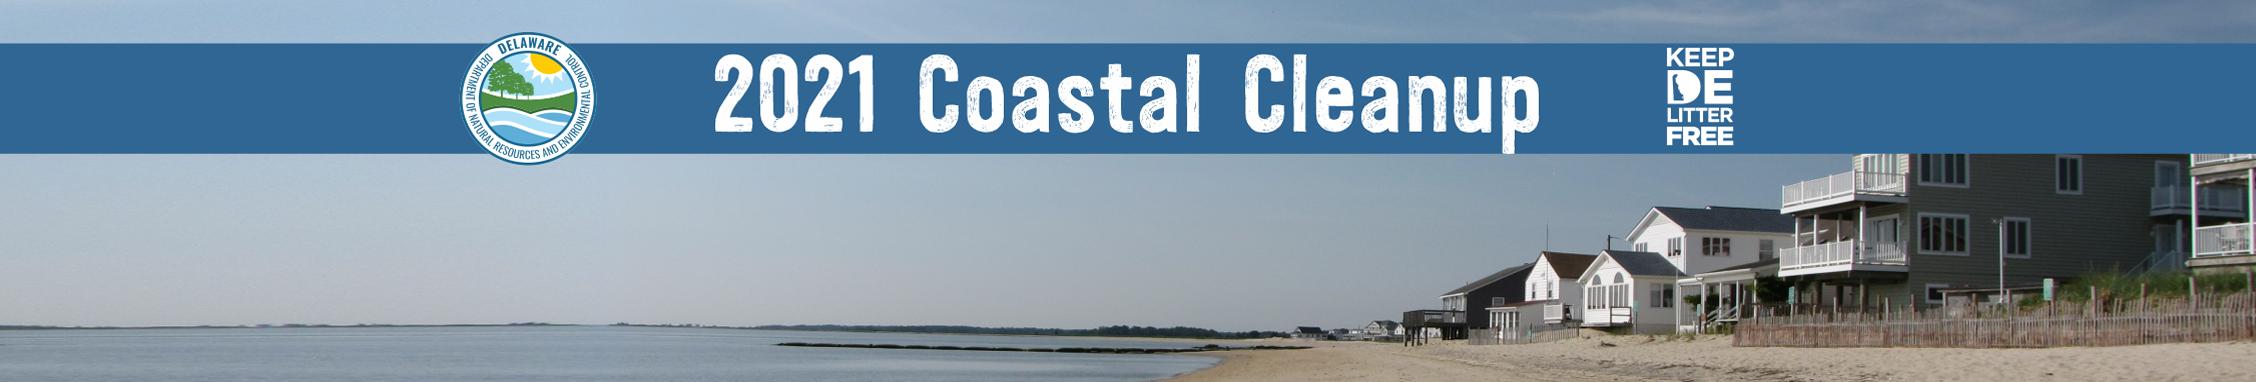 2021 Delaware Coastal Cleanup